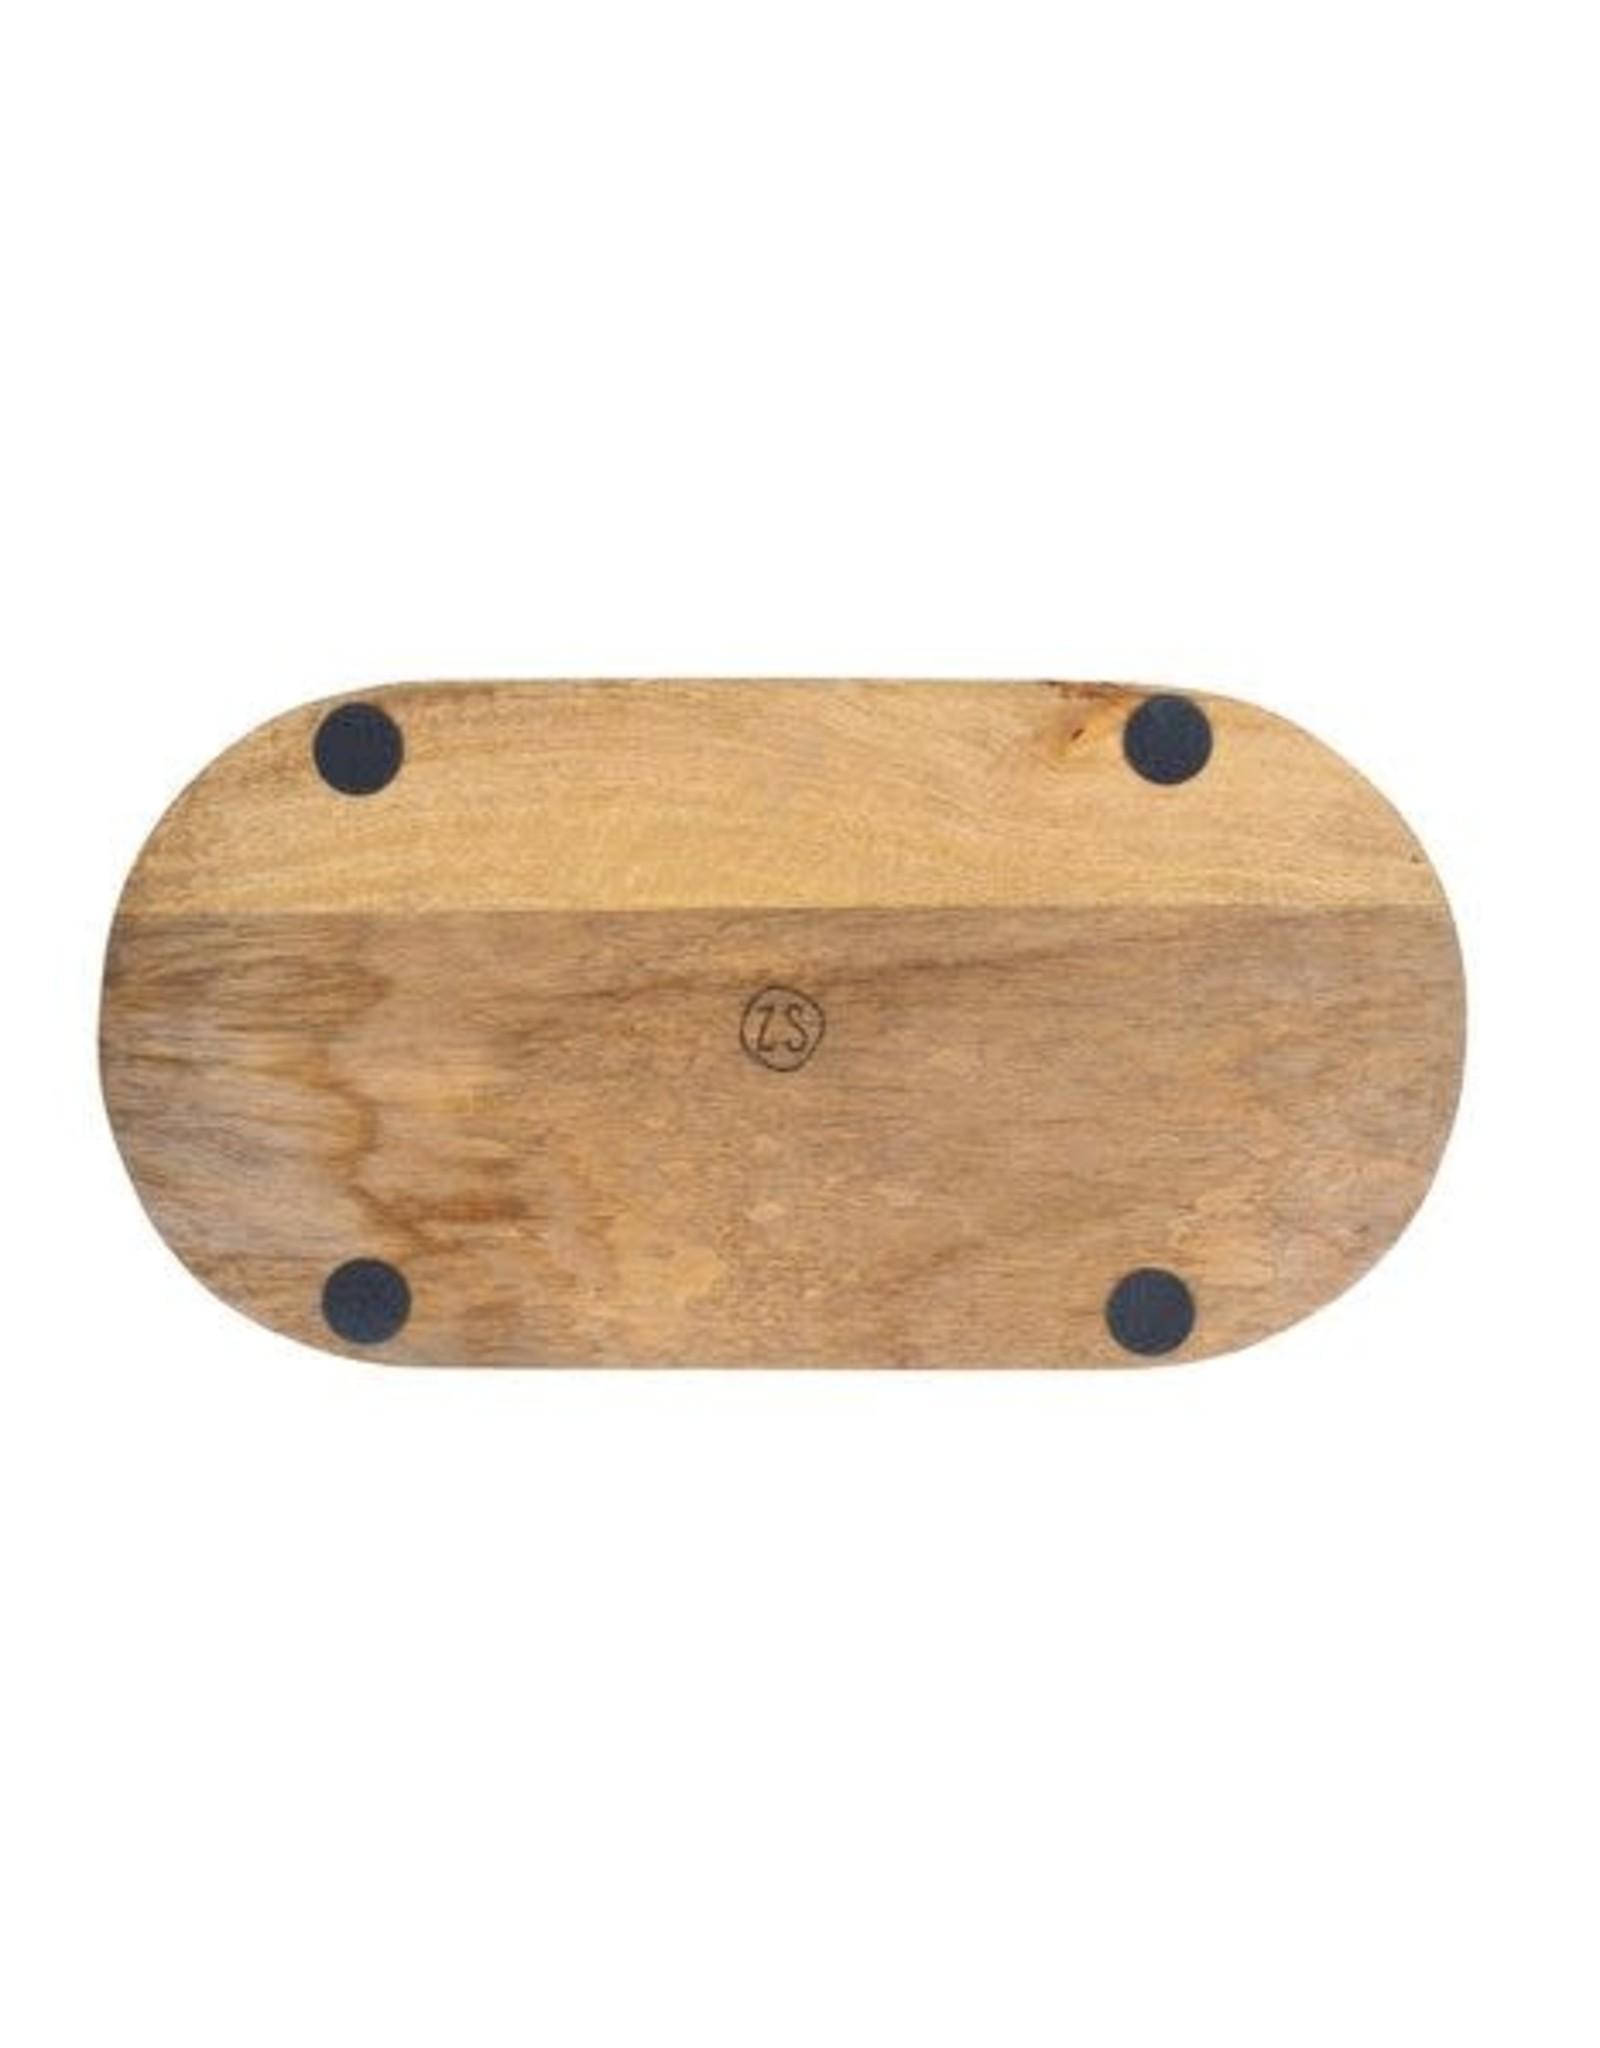 Zusss Zusss - Houten dienblad - Ovaal - 40cm